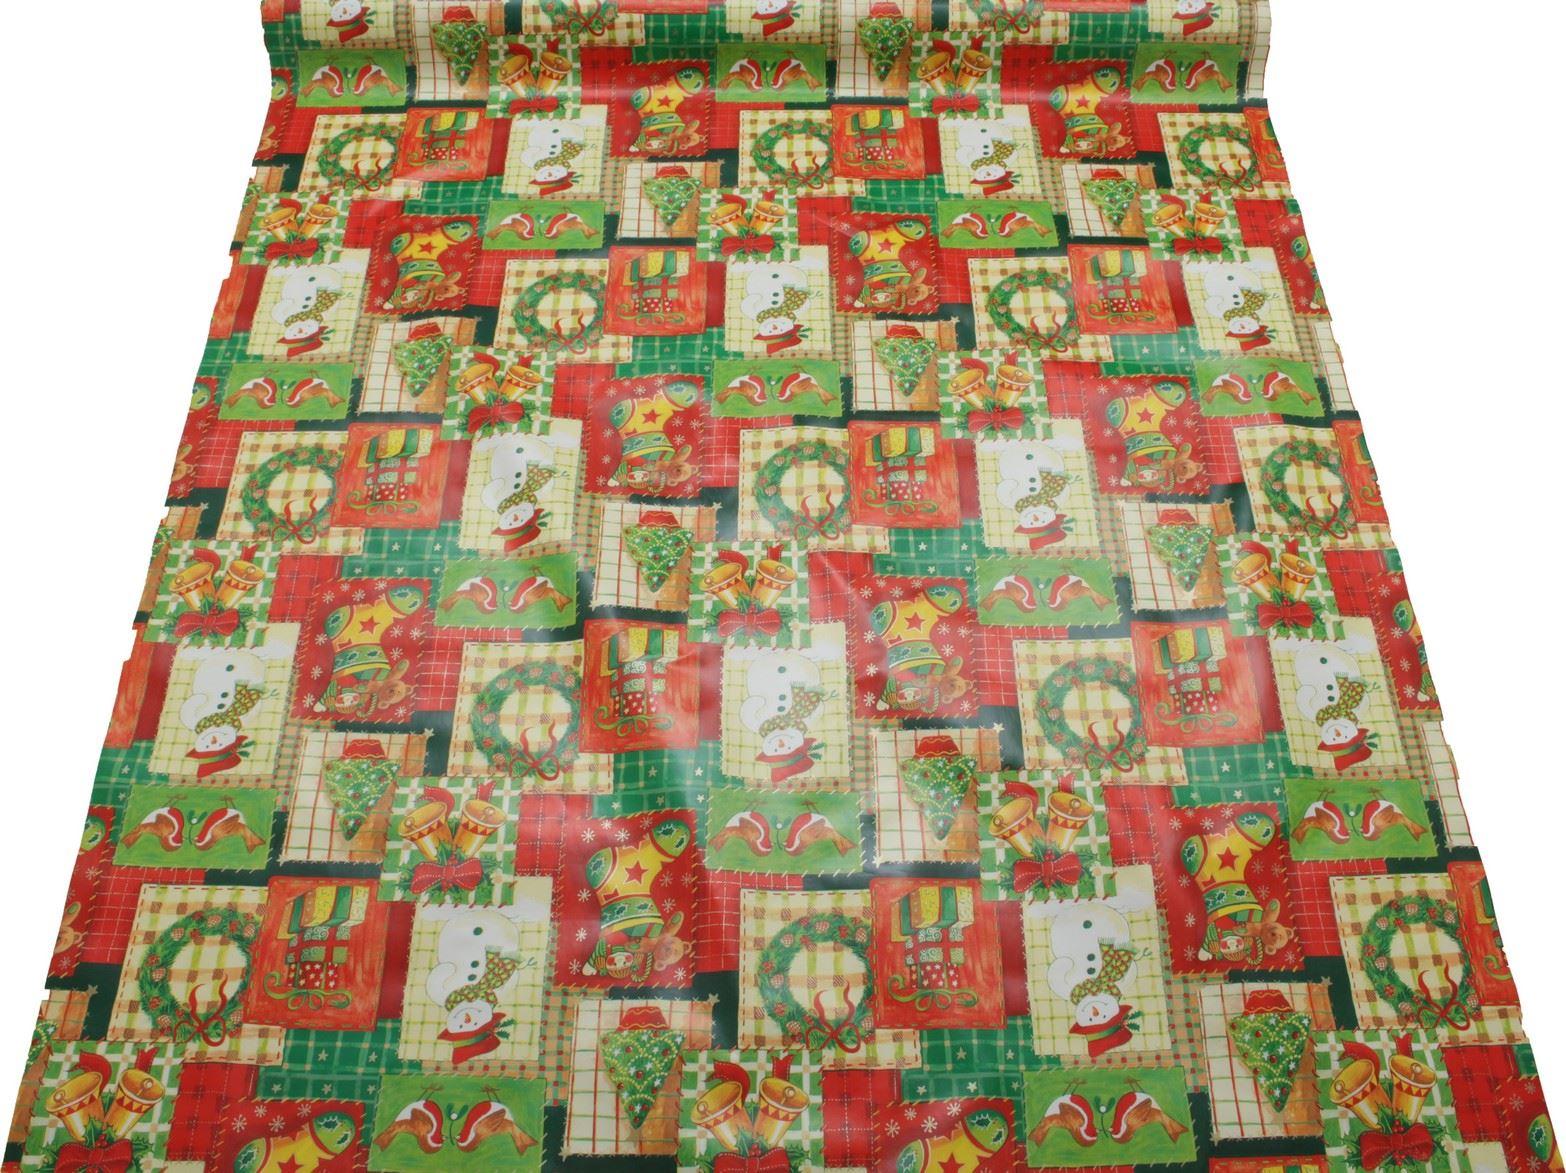 thumbnail 16 - CHRISTMAS PVC OILCLOTH VINYL FABRIC XMAS KITCHEN TABLE WIPECLEAN TABLECLOTHS